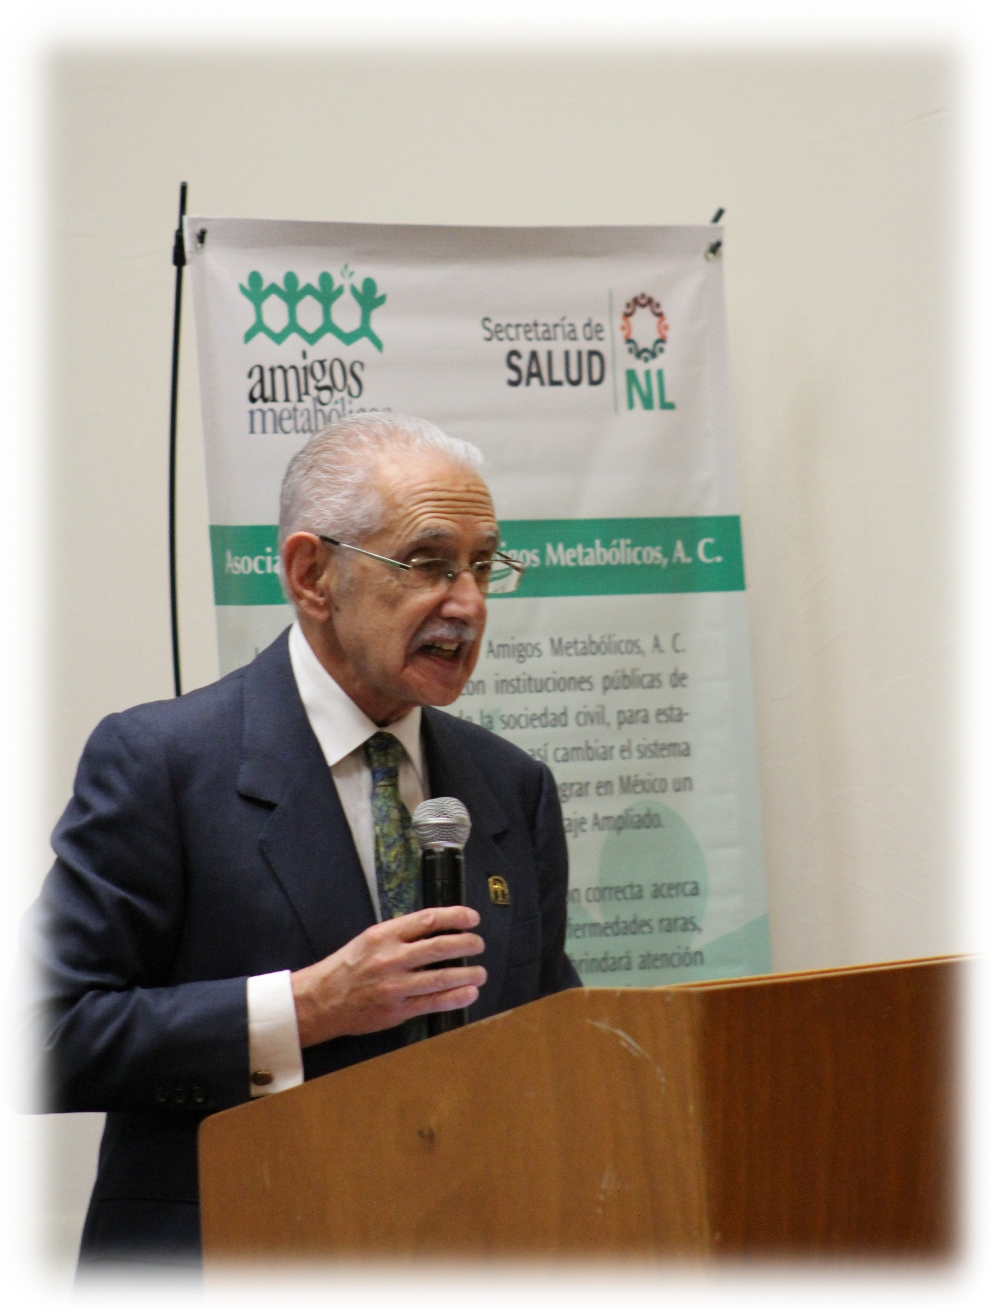 03-conferencia-magistral-dr-antonio-velazquez-arellano-img_4808